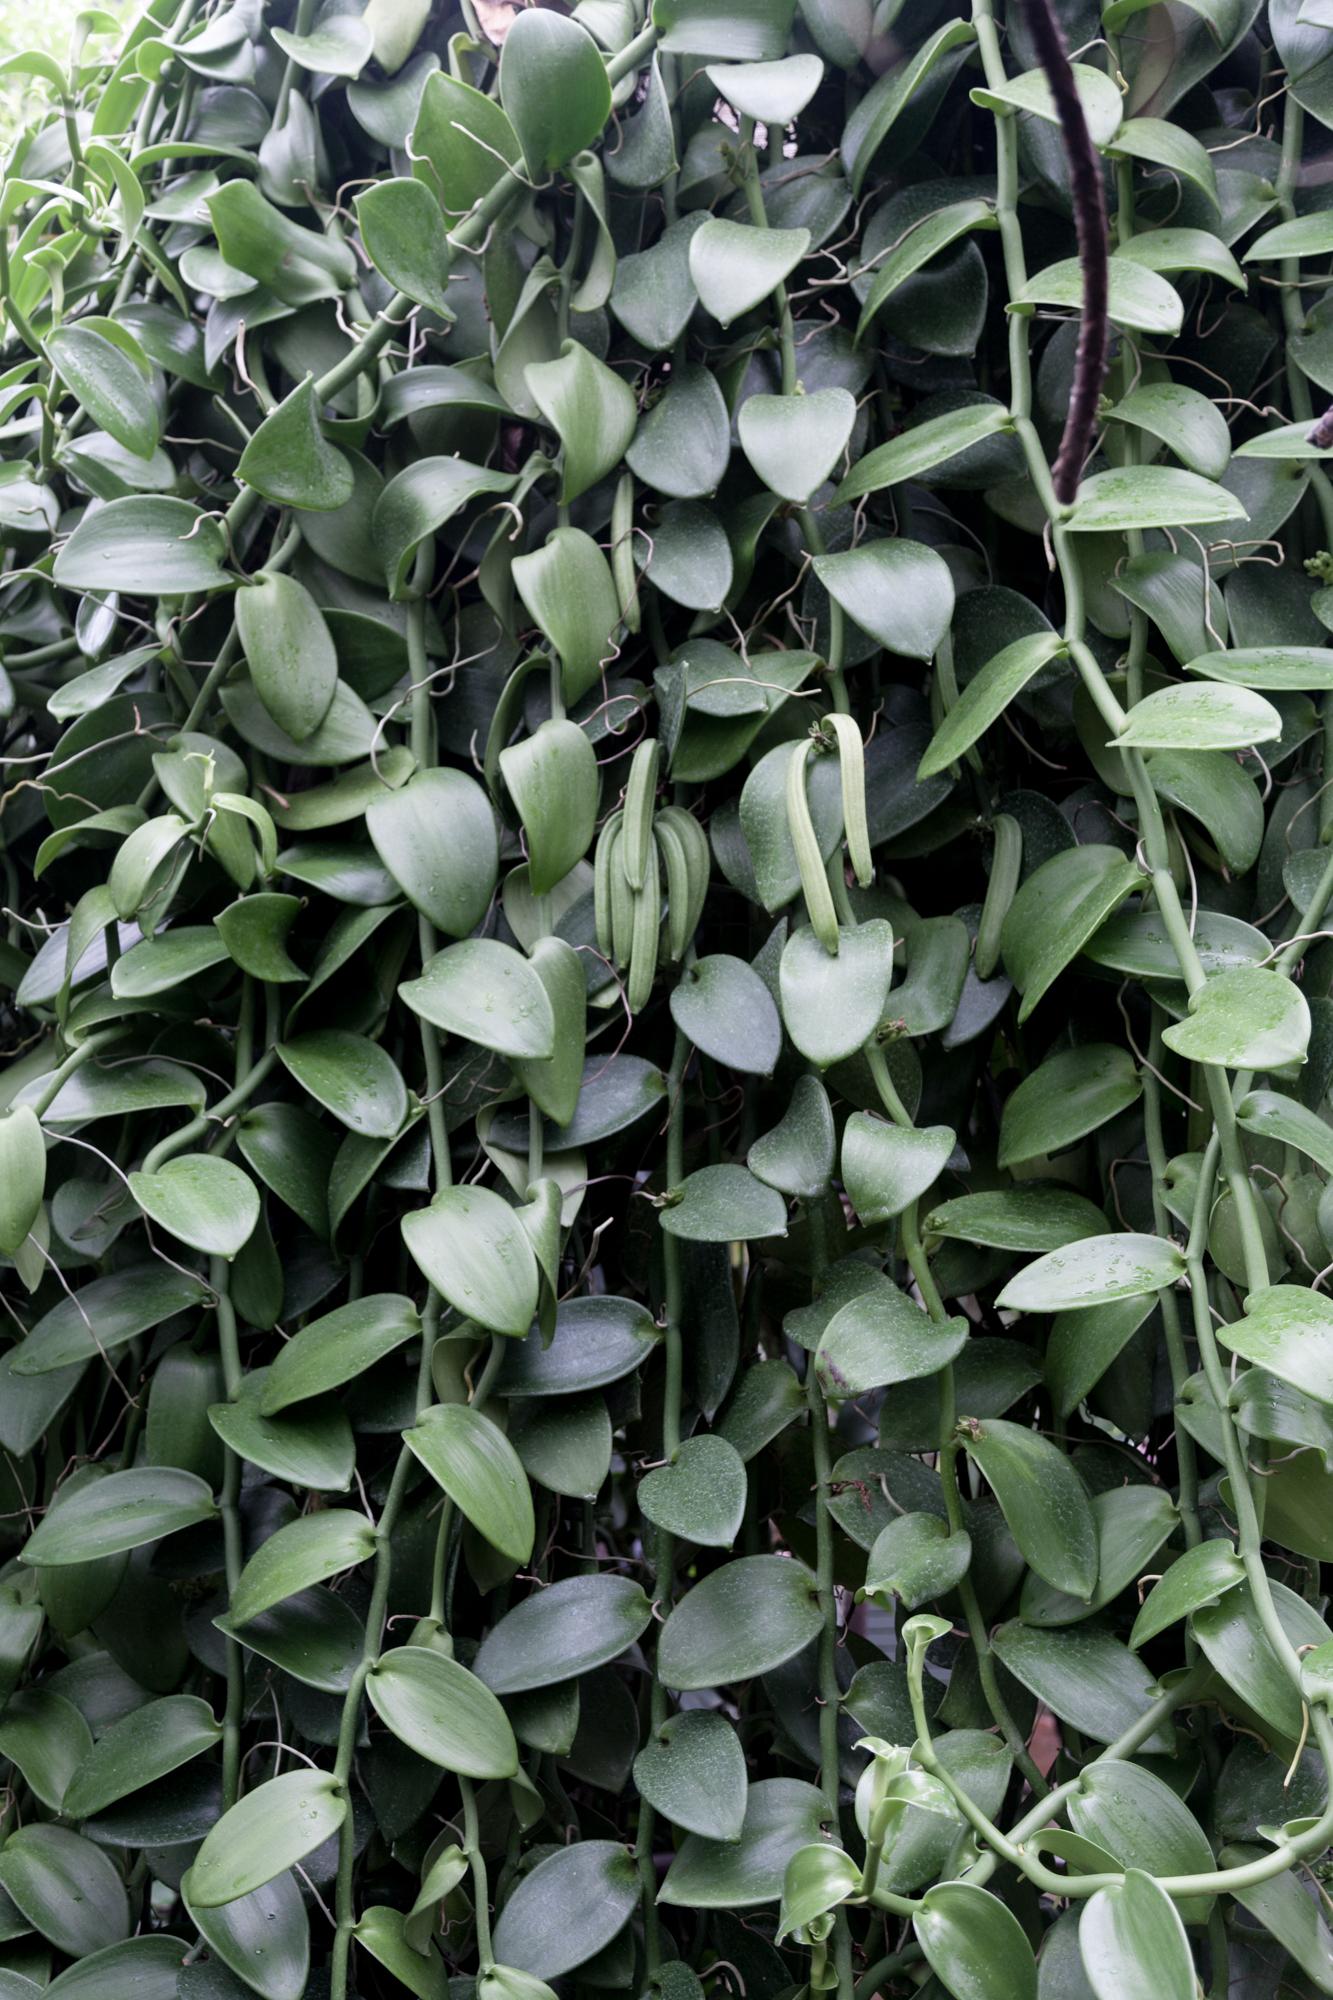 A very verdant  Vanilla planifolia  orchid.